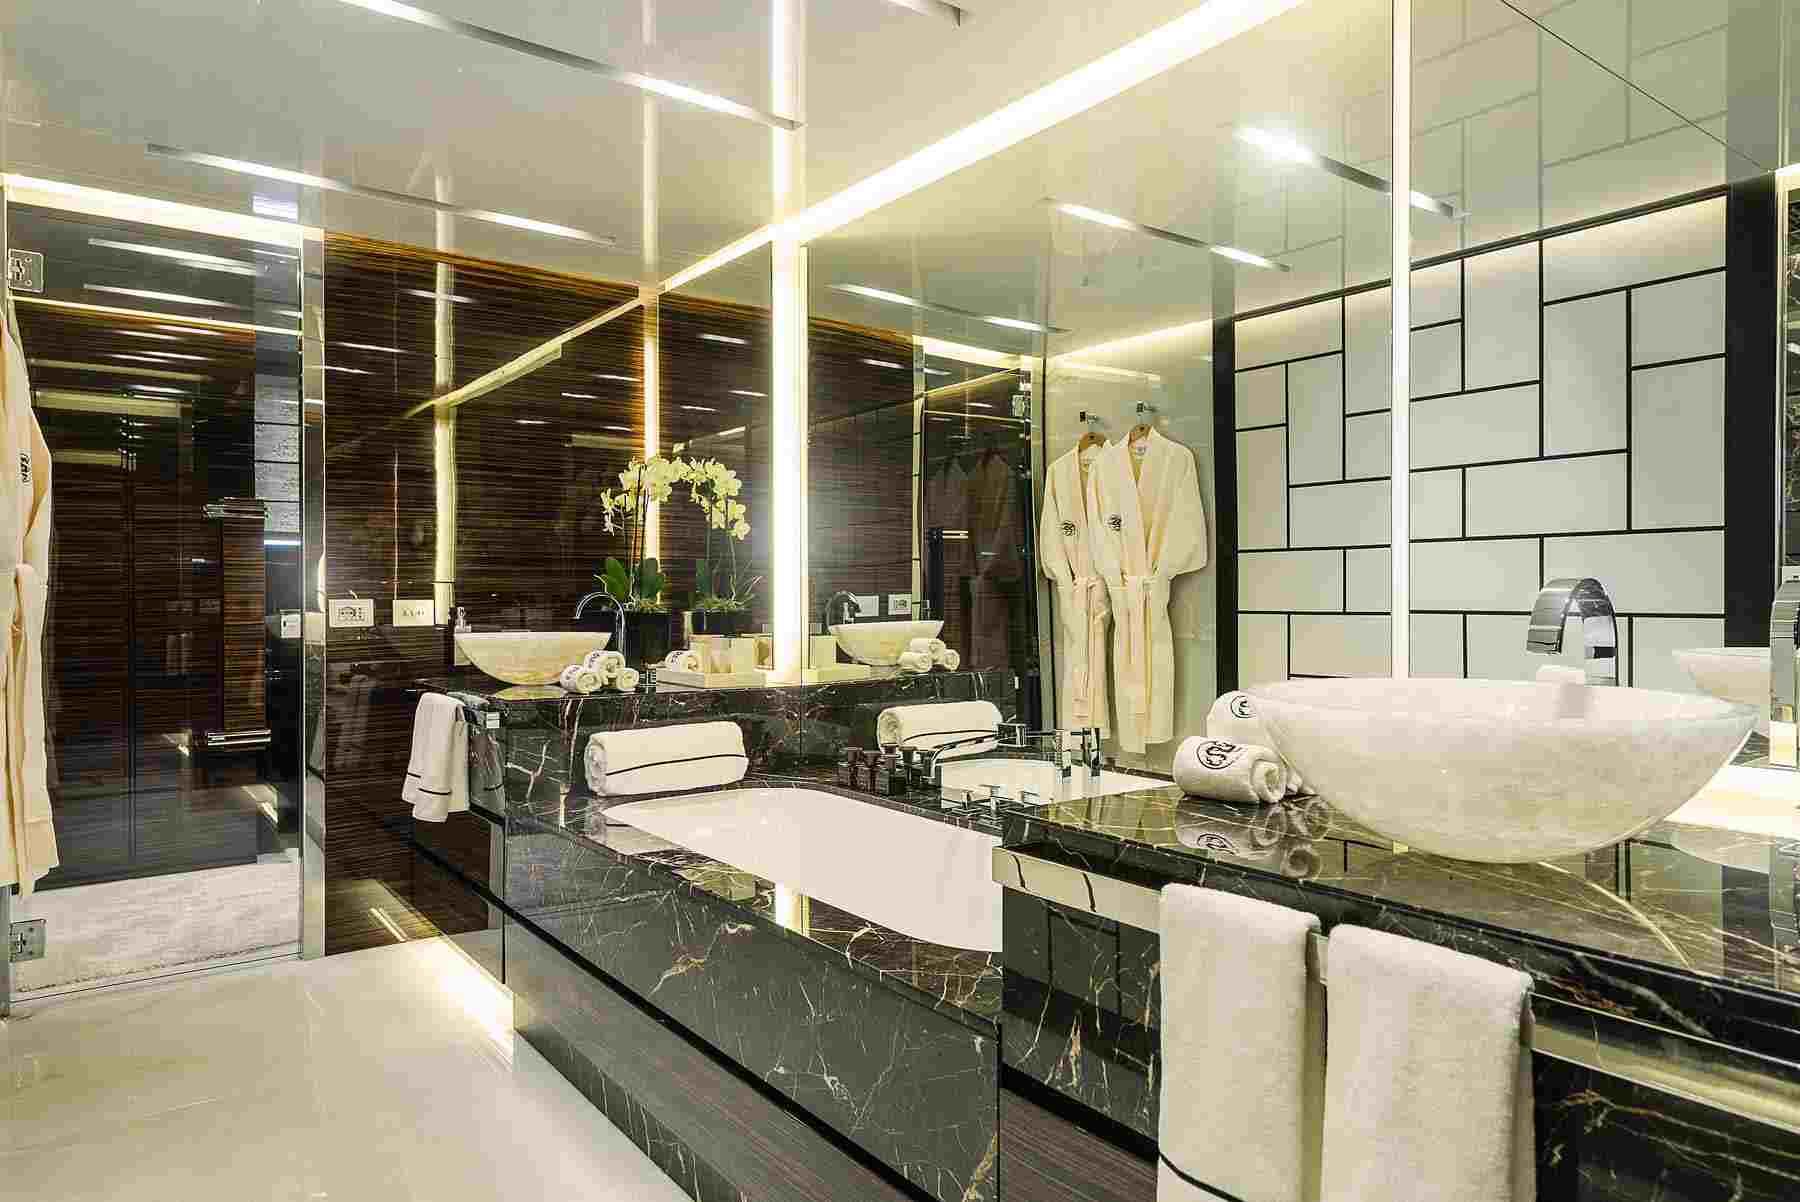 marmol negro idea baño lujo moderno perfecto